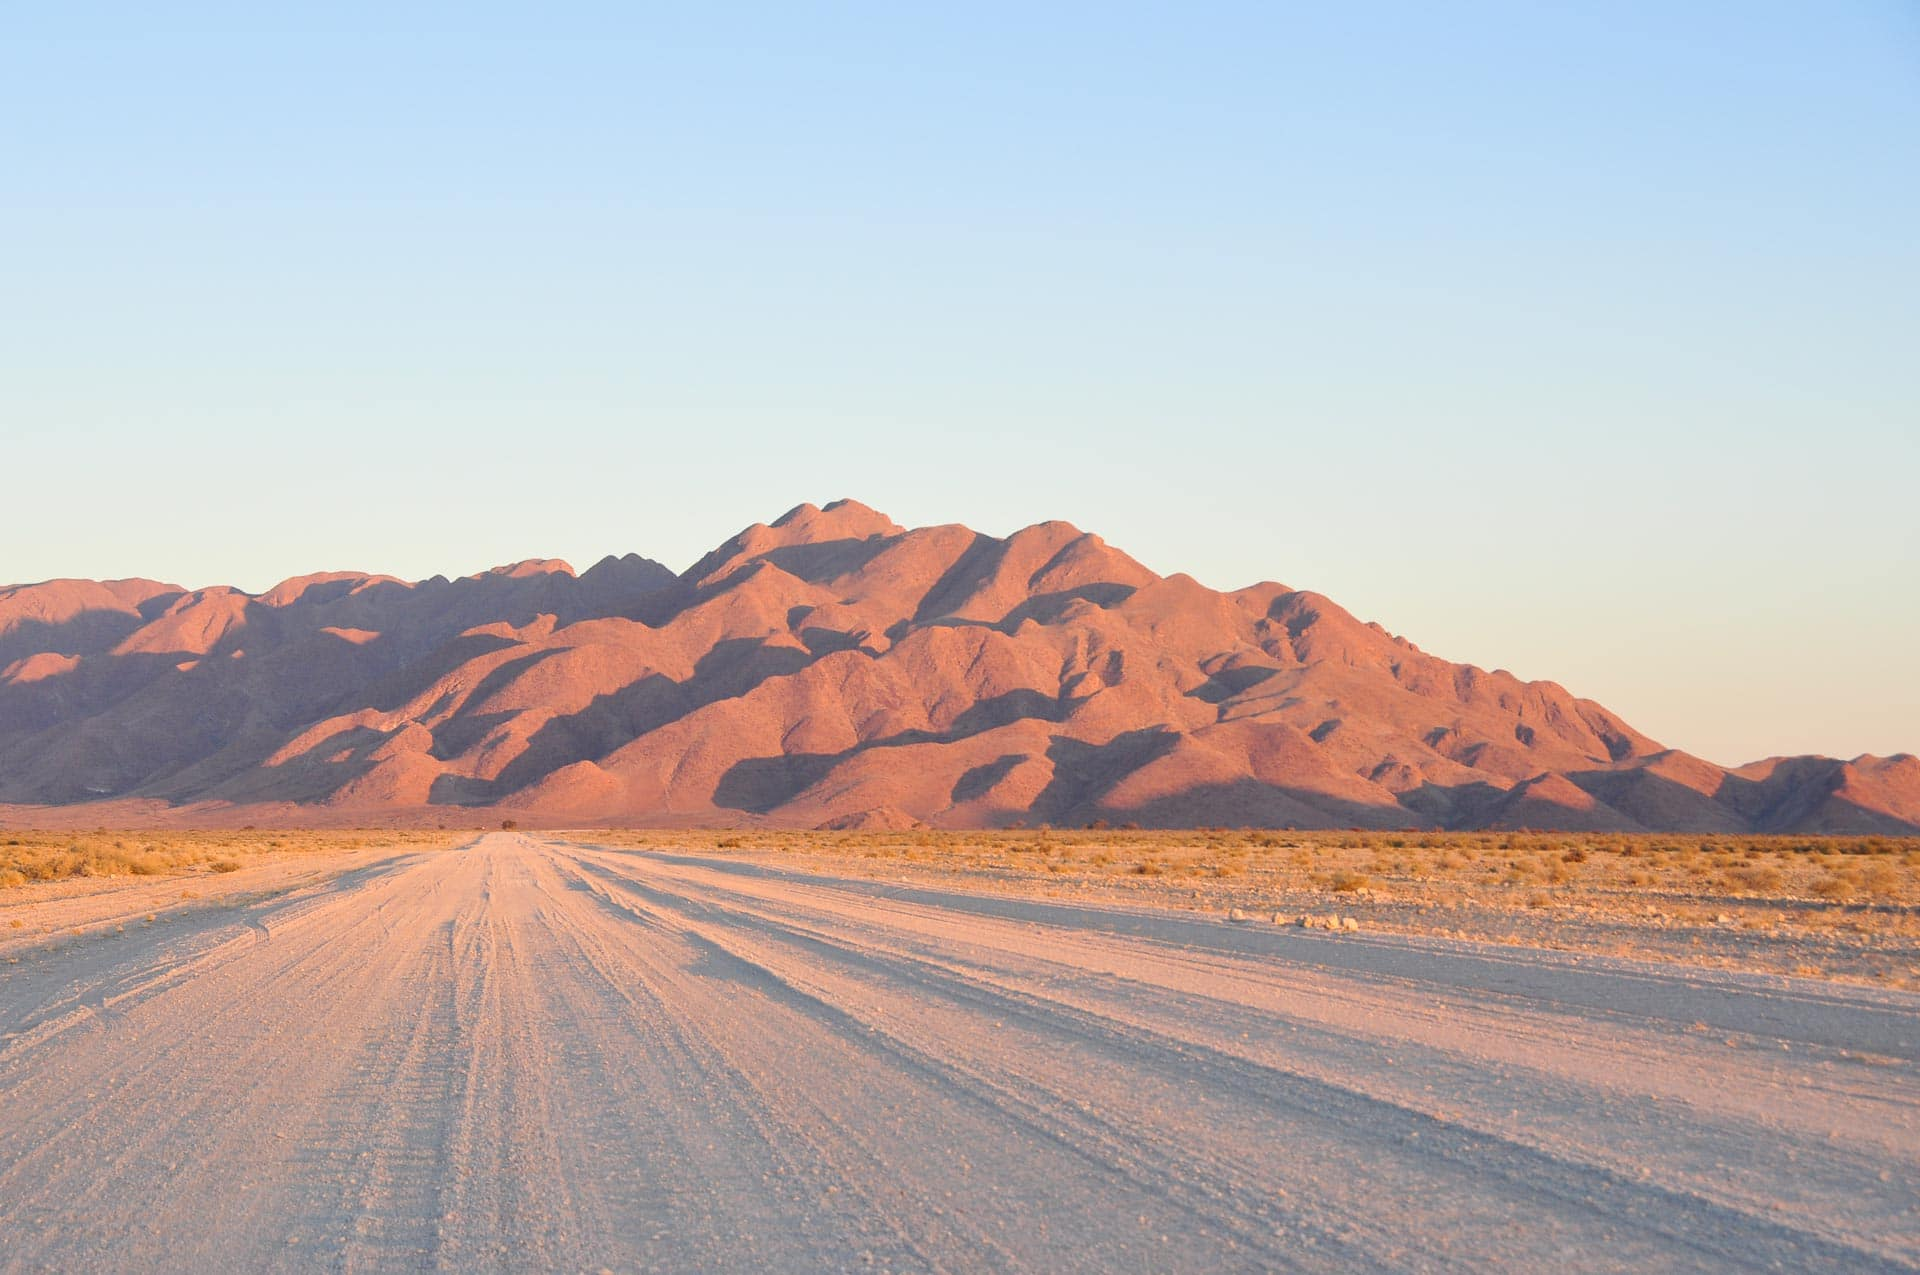 Sossuvlei-Wueste-Namib-Namibia-Globetrotter-Select-6